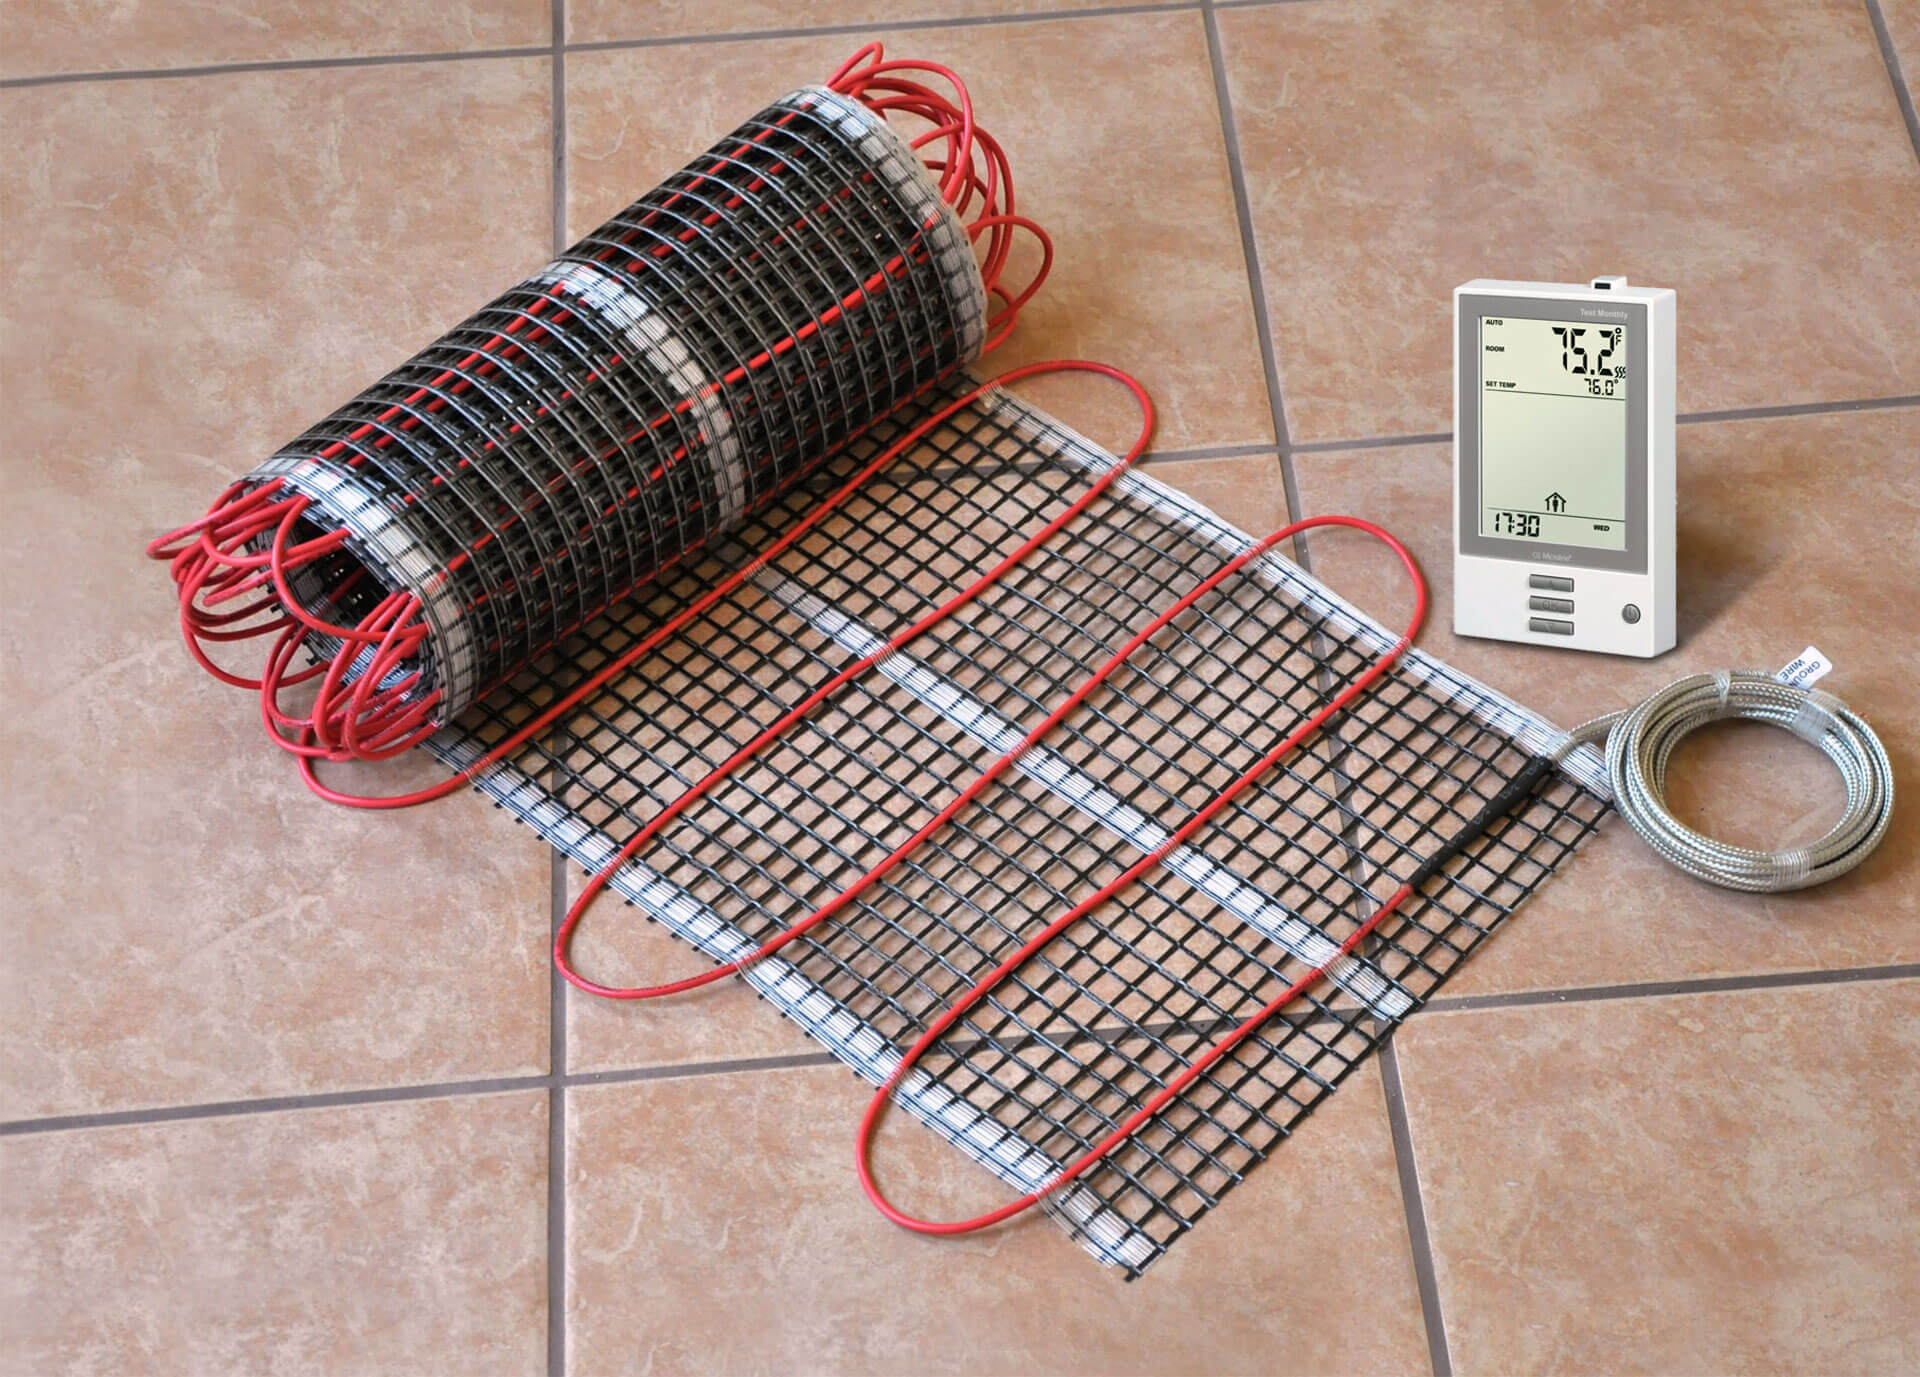 napelemes-aram-futopanelek-elektromos-futes